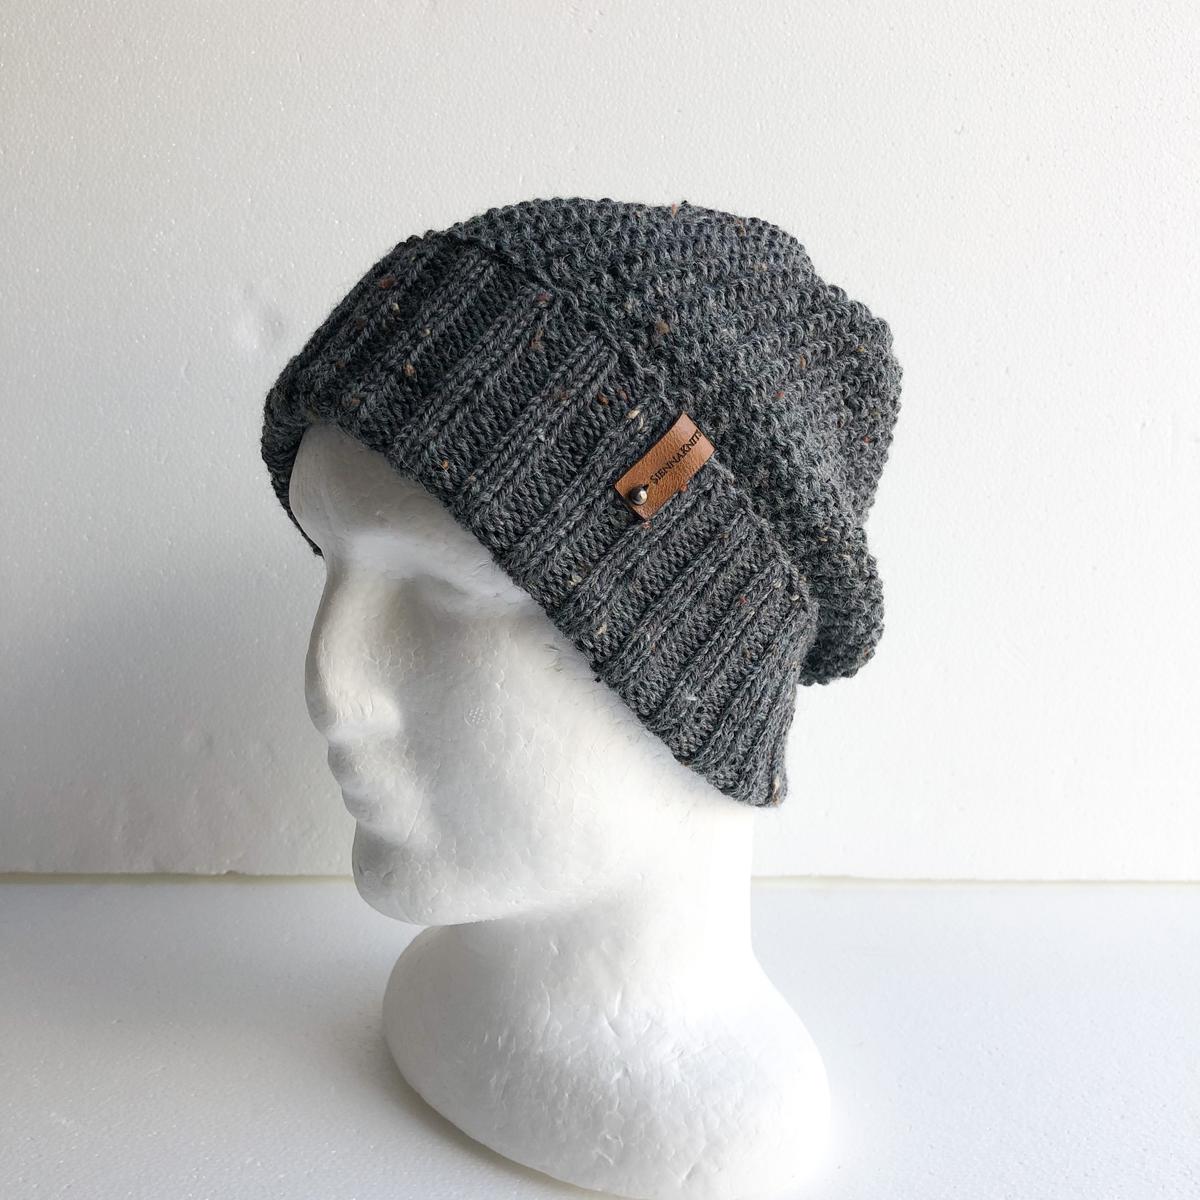 Men Speckled Dark Grey Wool Knit Beanie With Foldable Brim By SiennaKnits